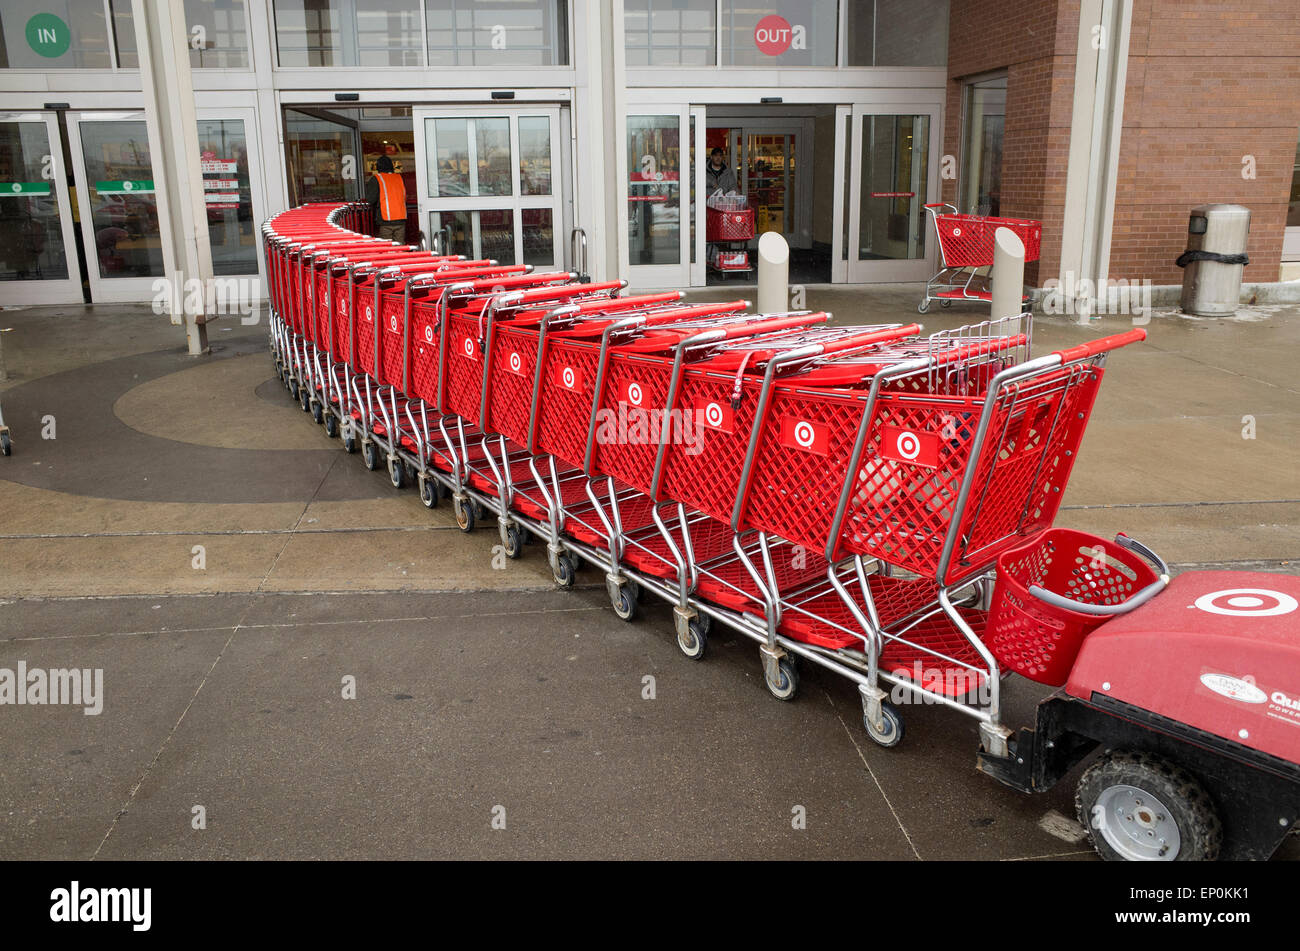 target shopping cart stock photos target shopping cart stock images alamy. Black Bedroom Furniture Sets. Home Design Ideas